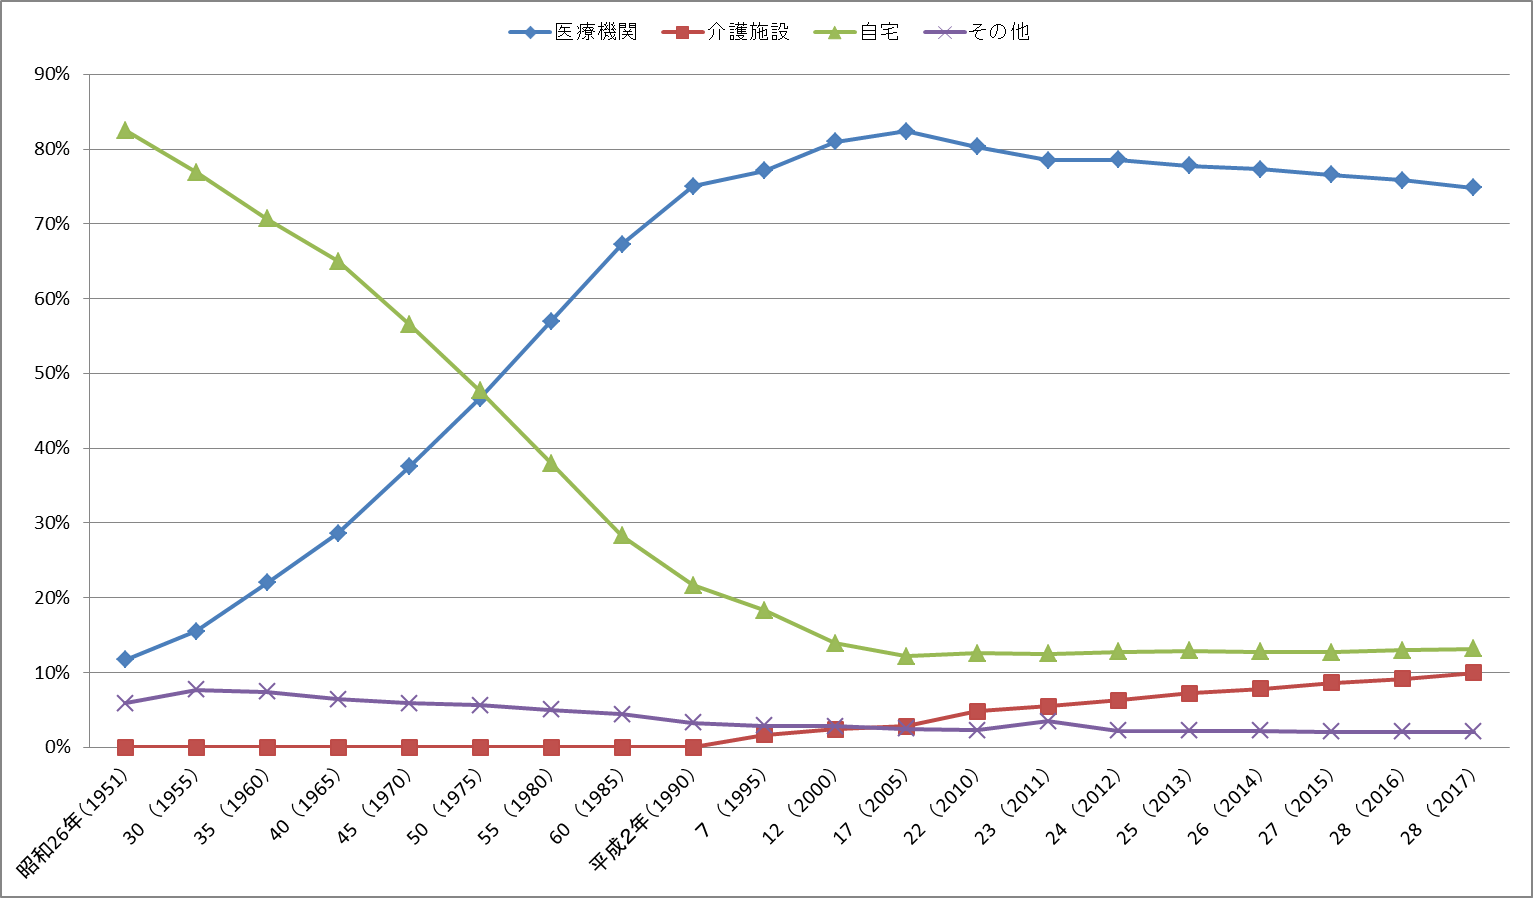 人口動態統計(確定数)線グラフ